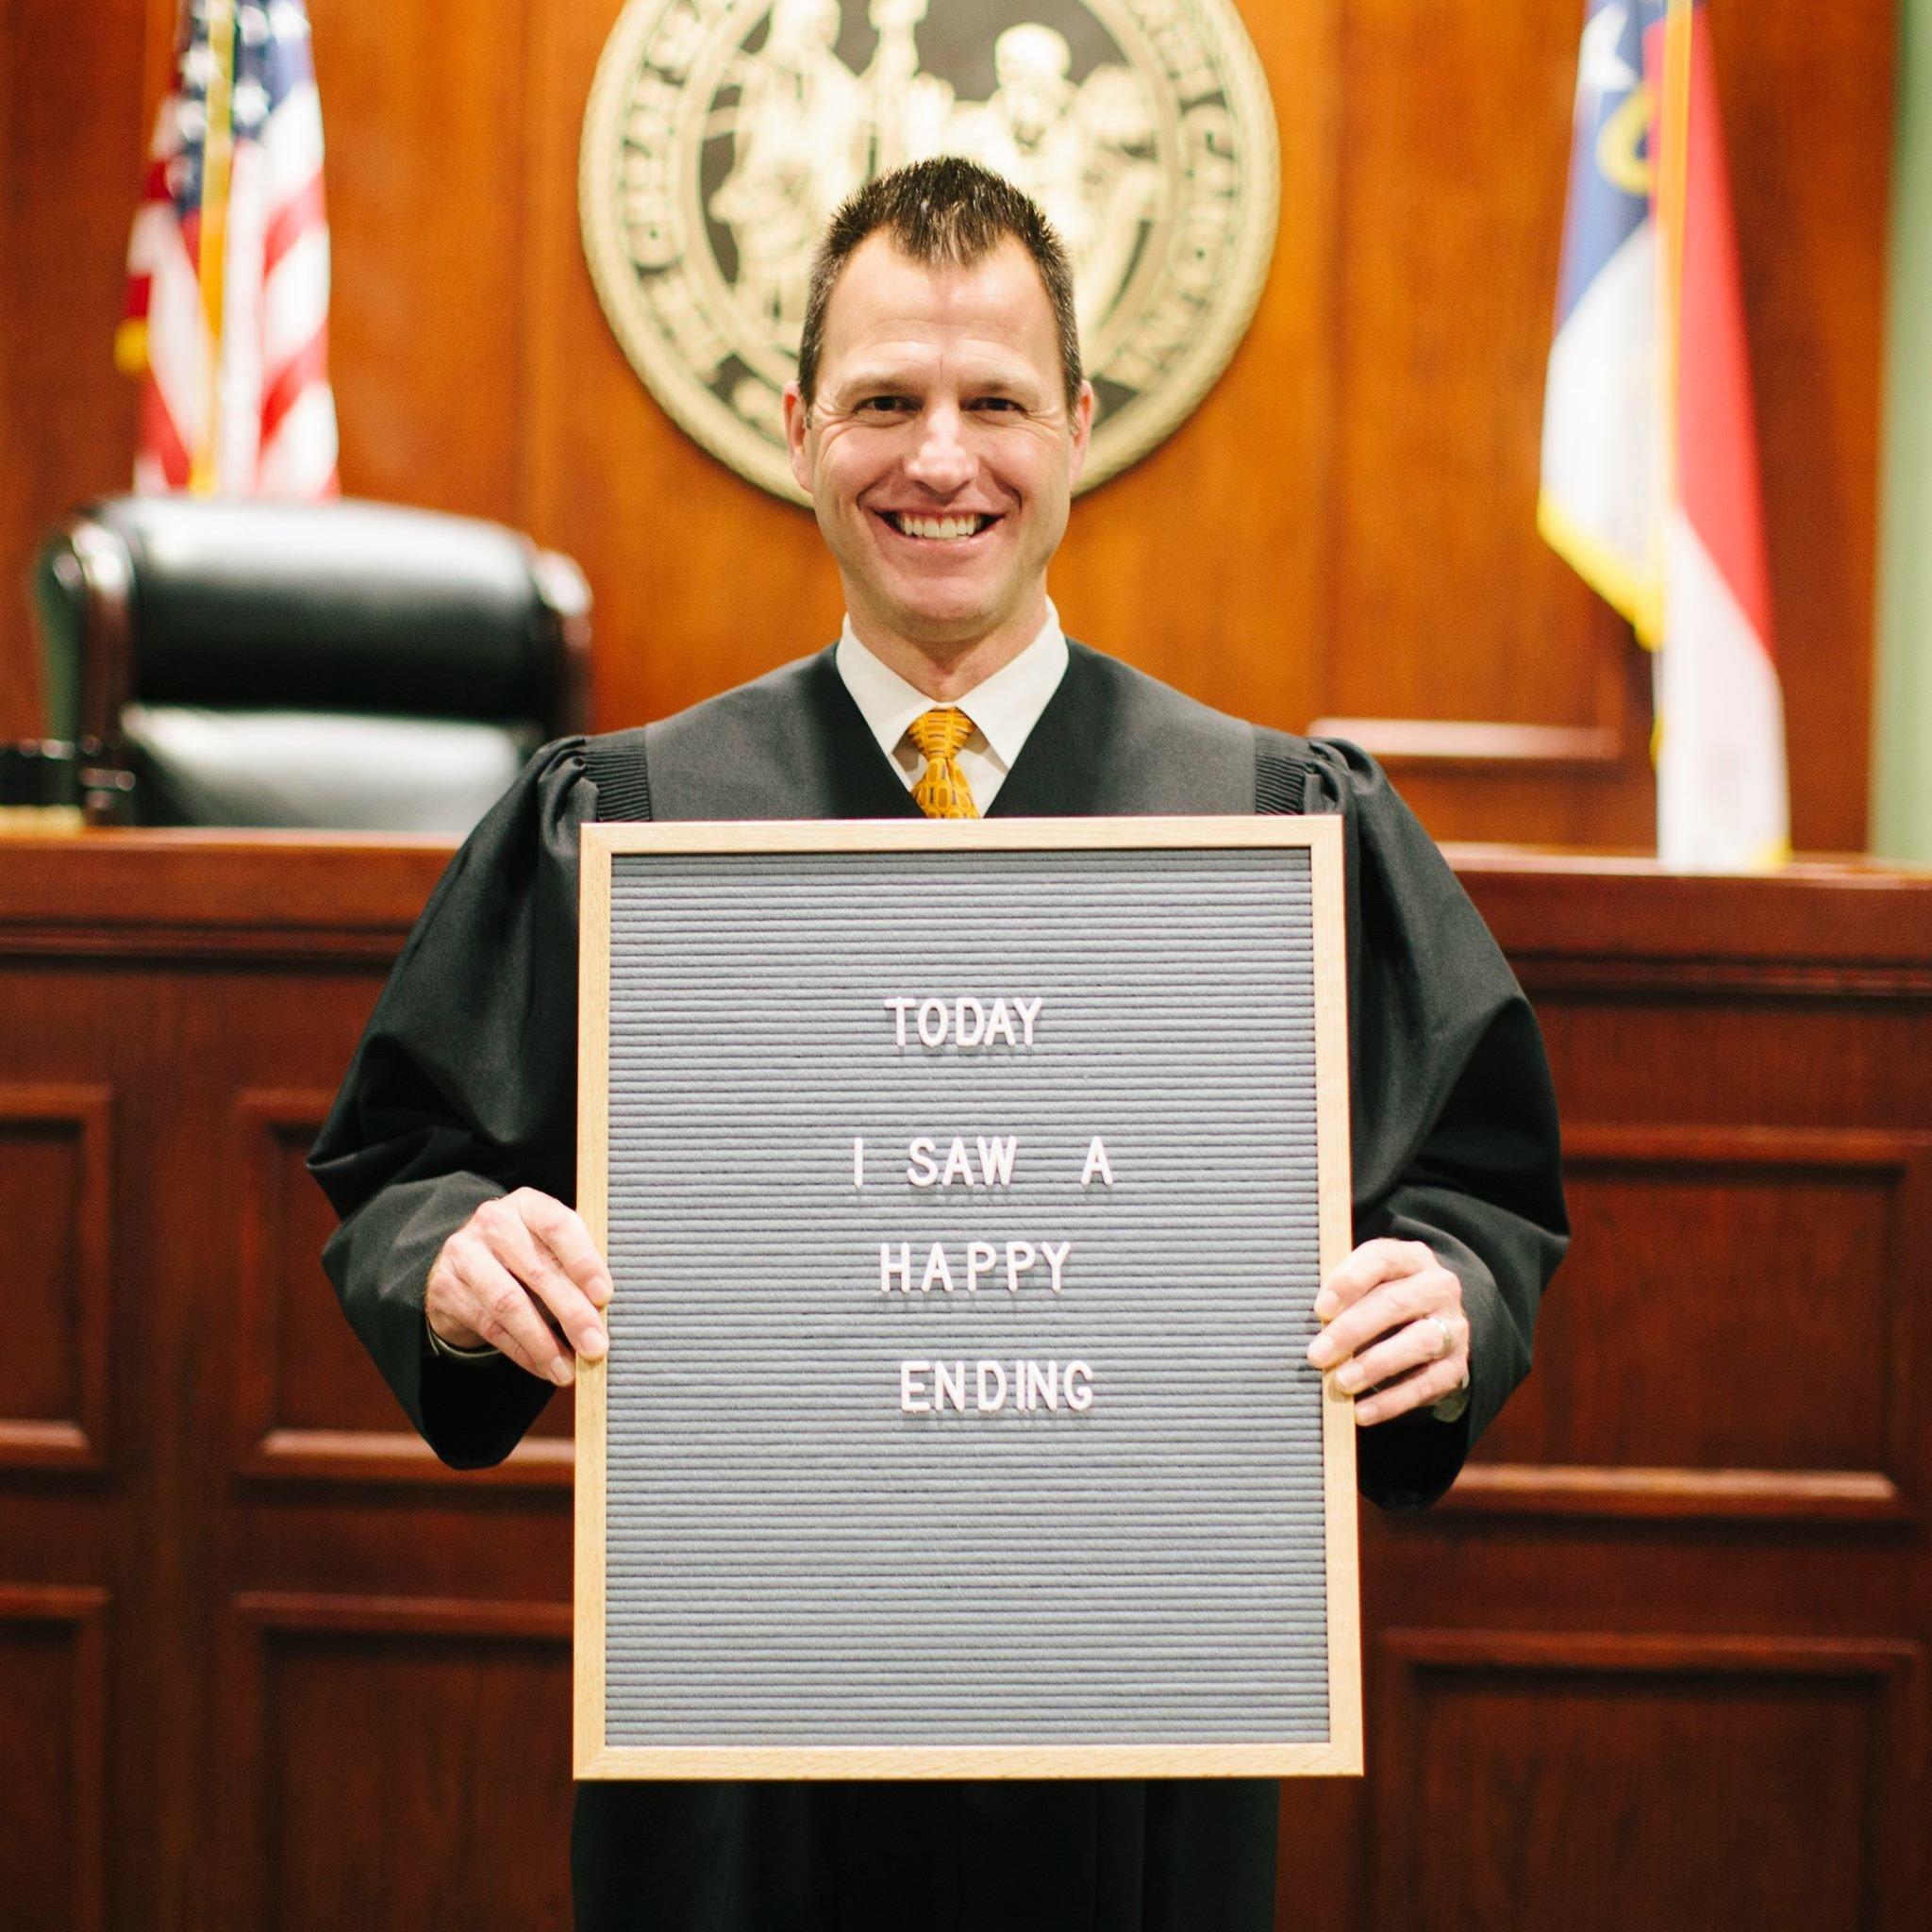 The judge, Jason Disbrow